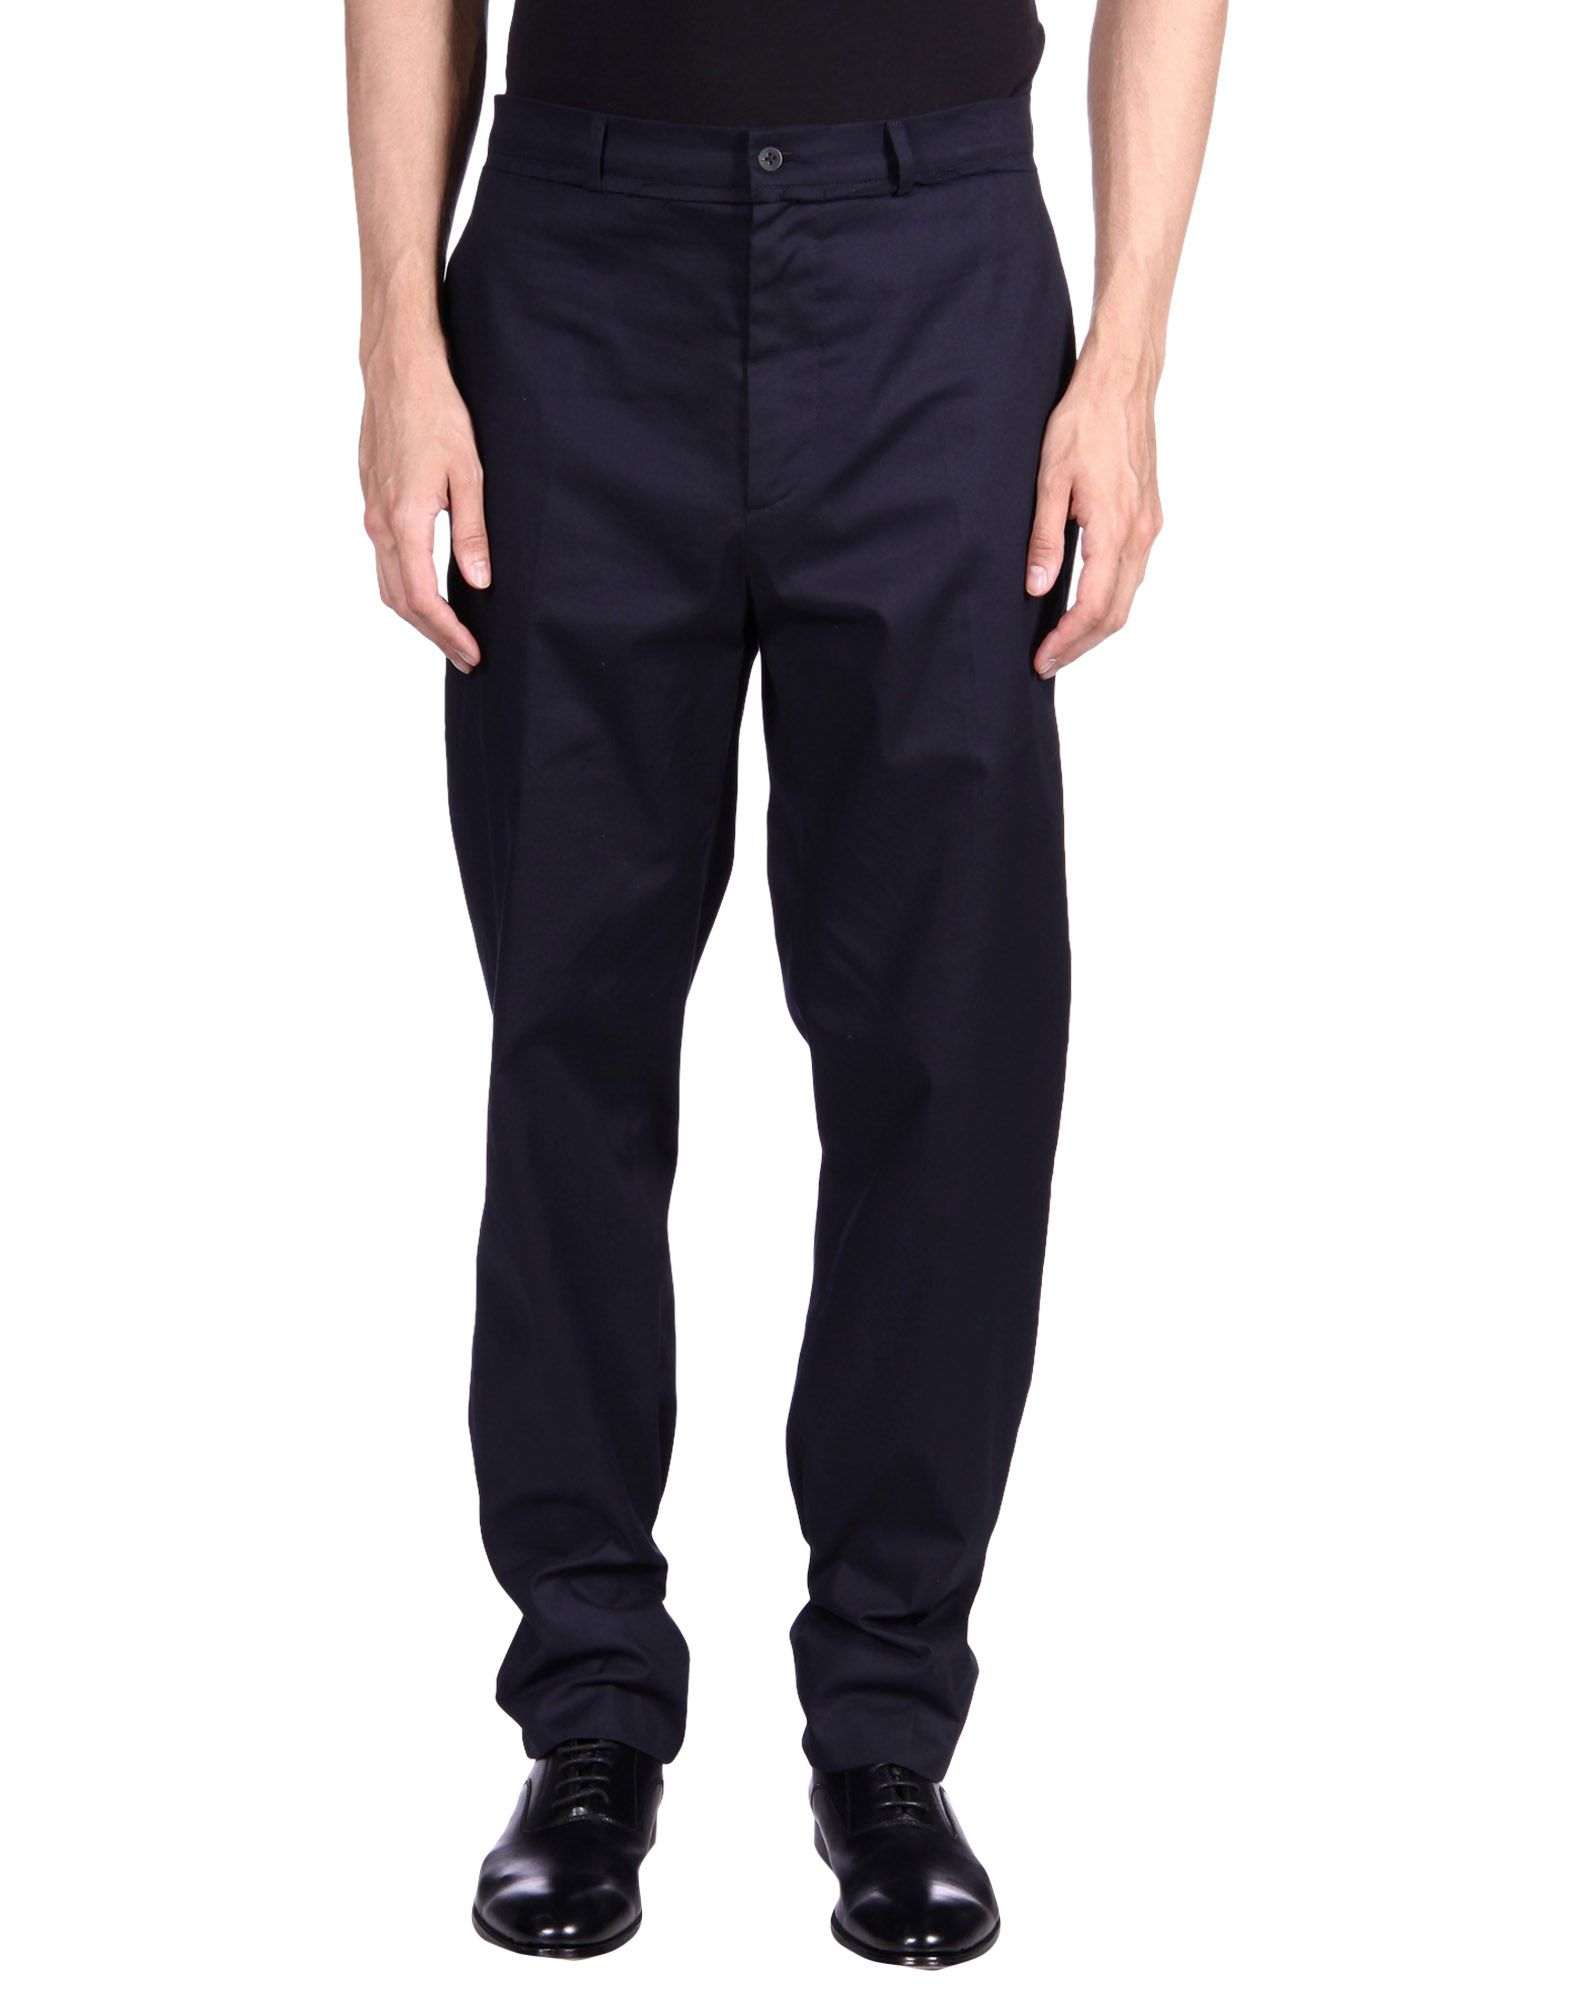 TILLMANN LAUTERBACH Casual Pants in Dark Blue